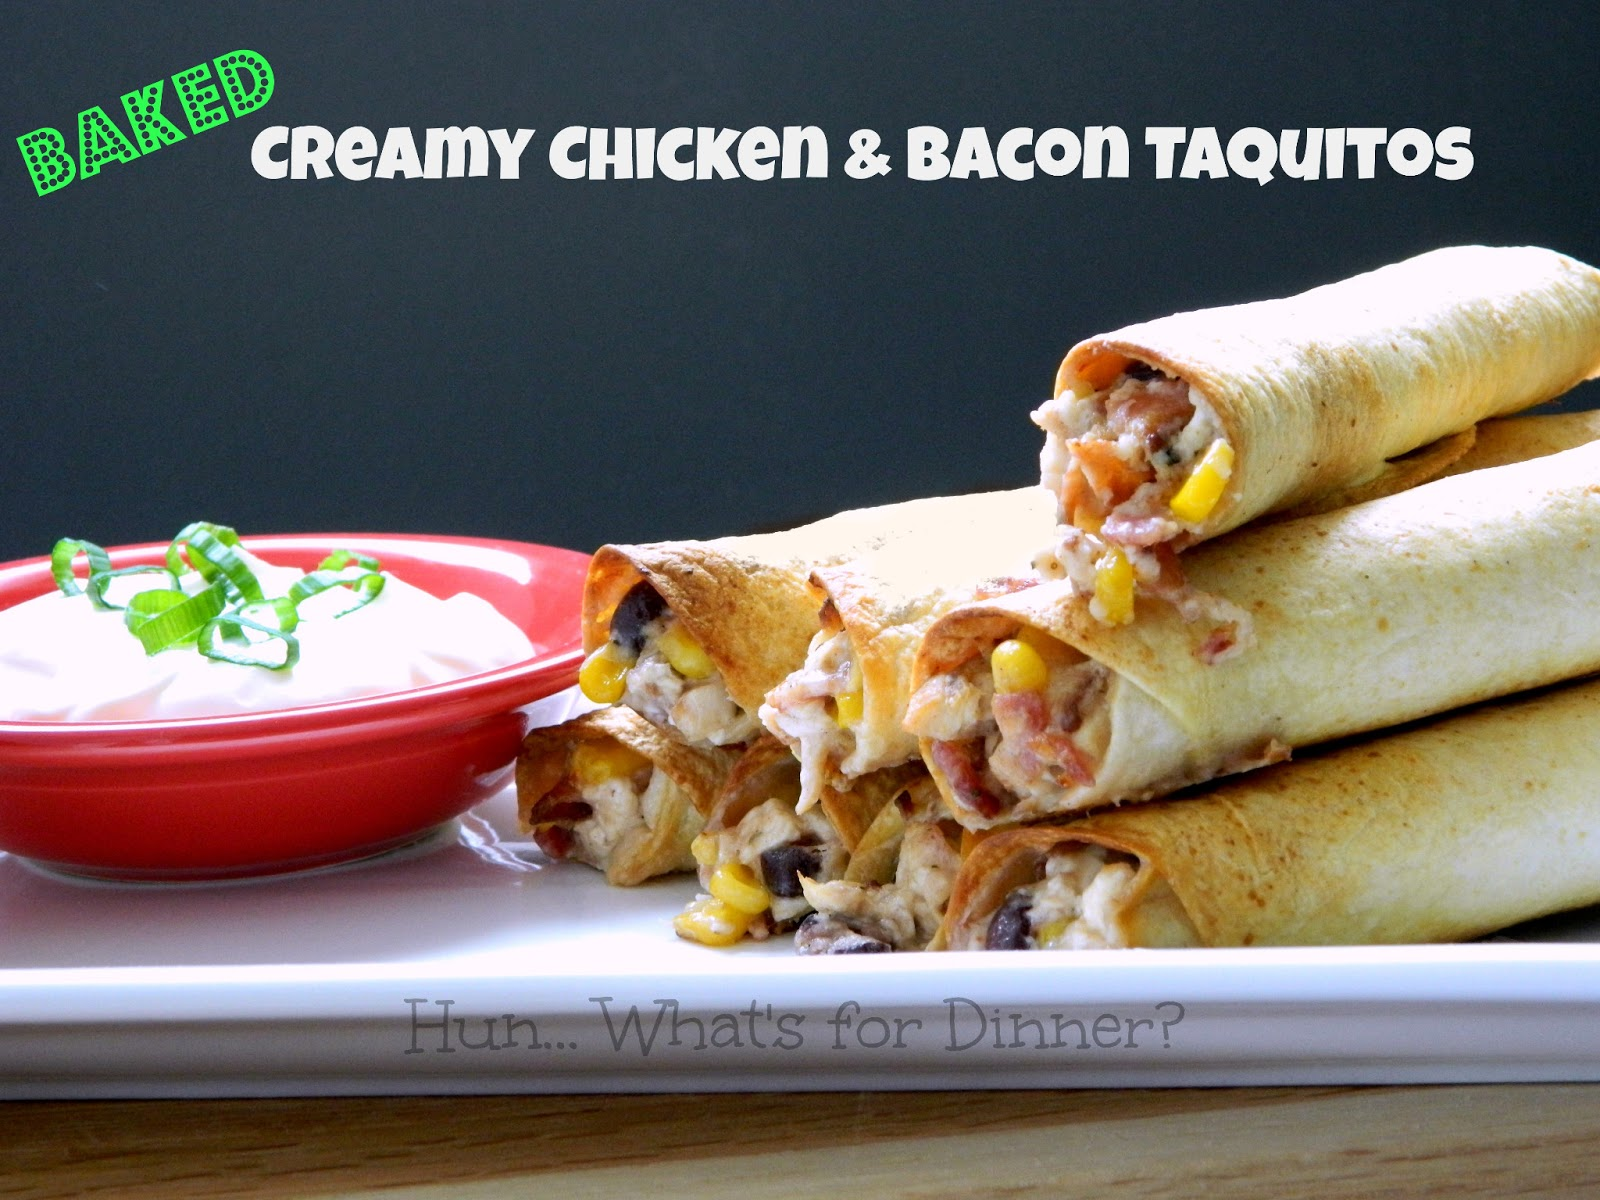 ... for Dinner?: Baked Creamy Chicken & Bacon Taquitos~ #SupriseRecipeSwap